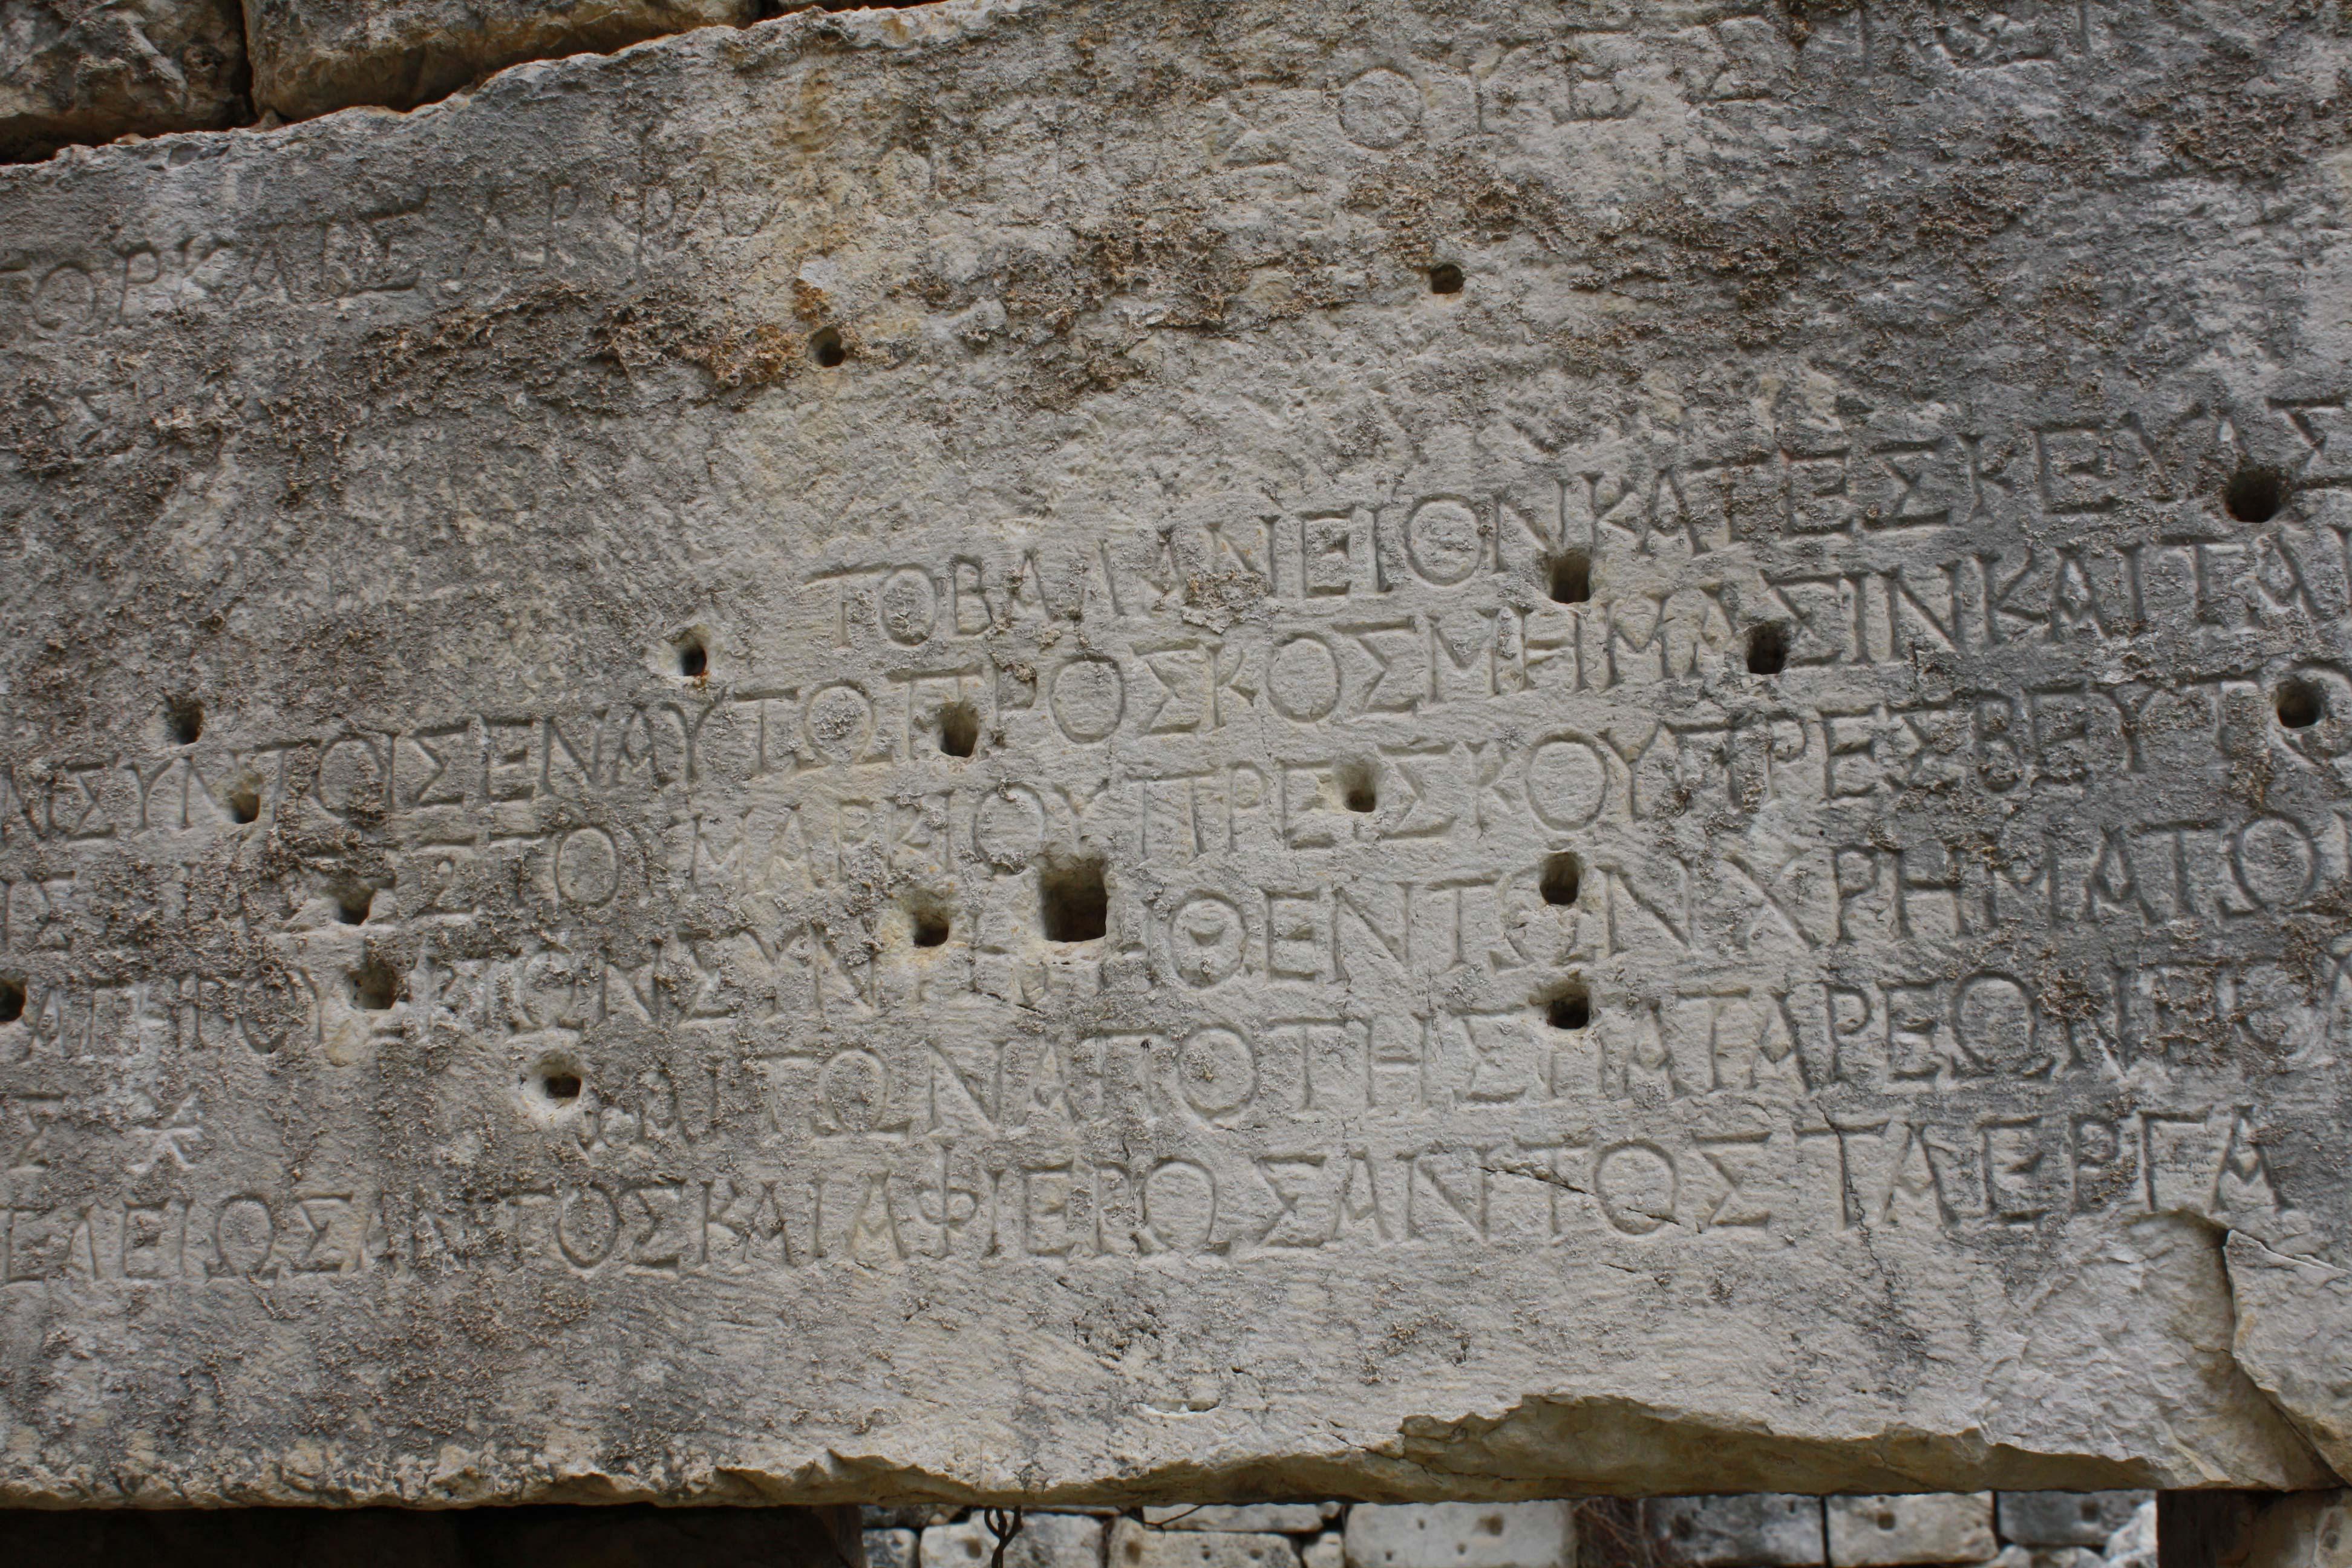 Patara Carving